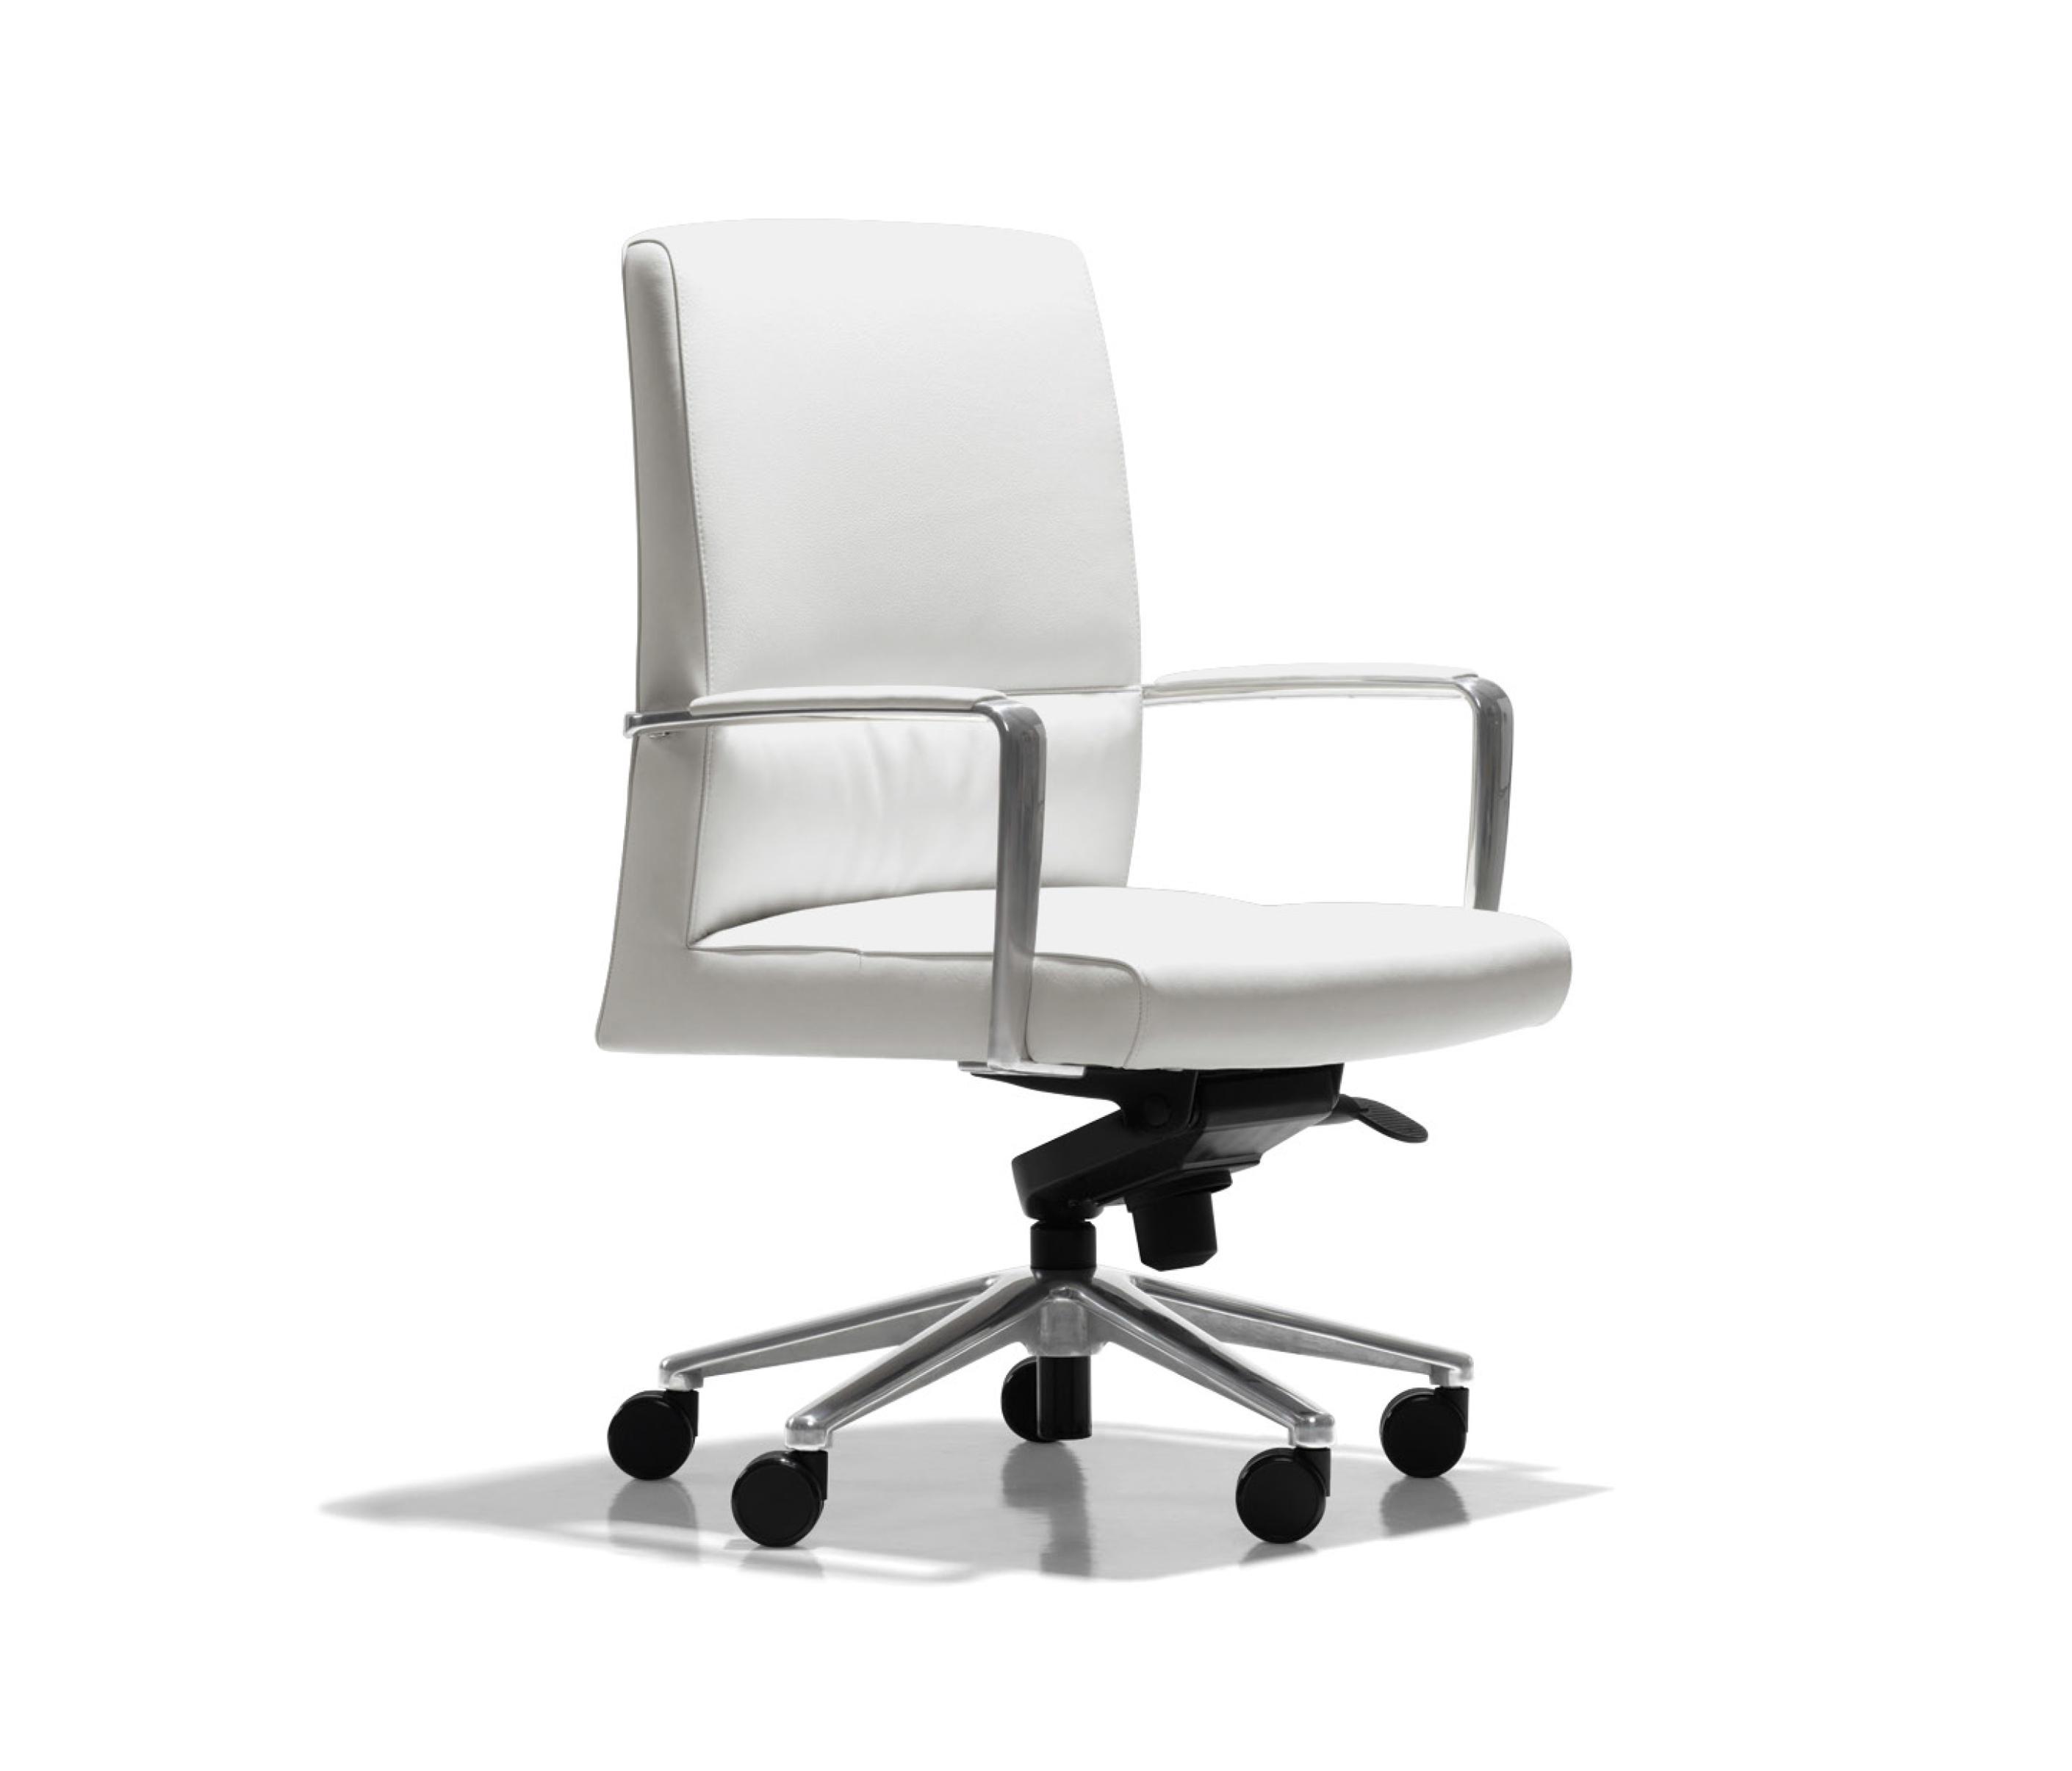 Stupendous Rice Chairs From Bernhardt Design Architonic Download Free Architecture Designs Photstoregrimeyleaguecom